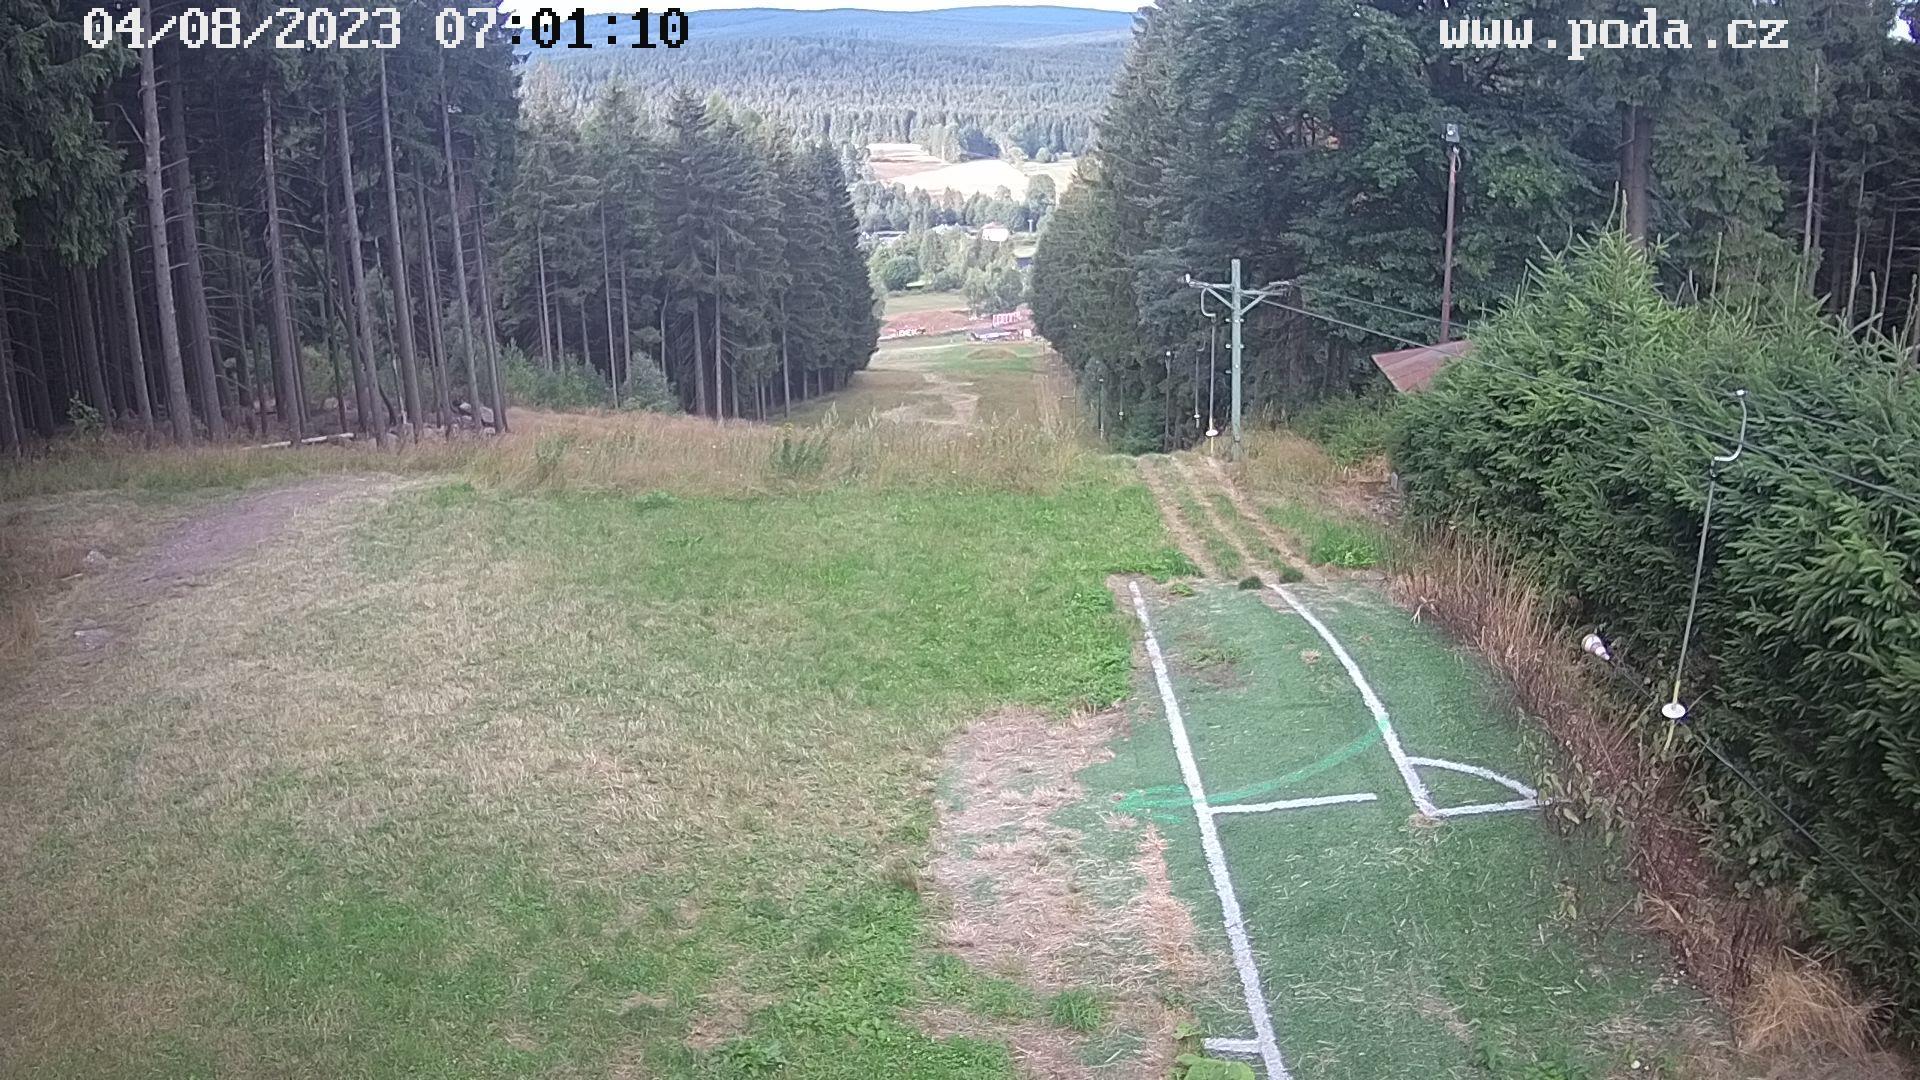 Webkamera na lyžařském svahu SKI Svratka